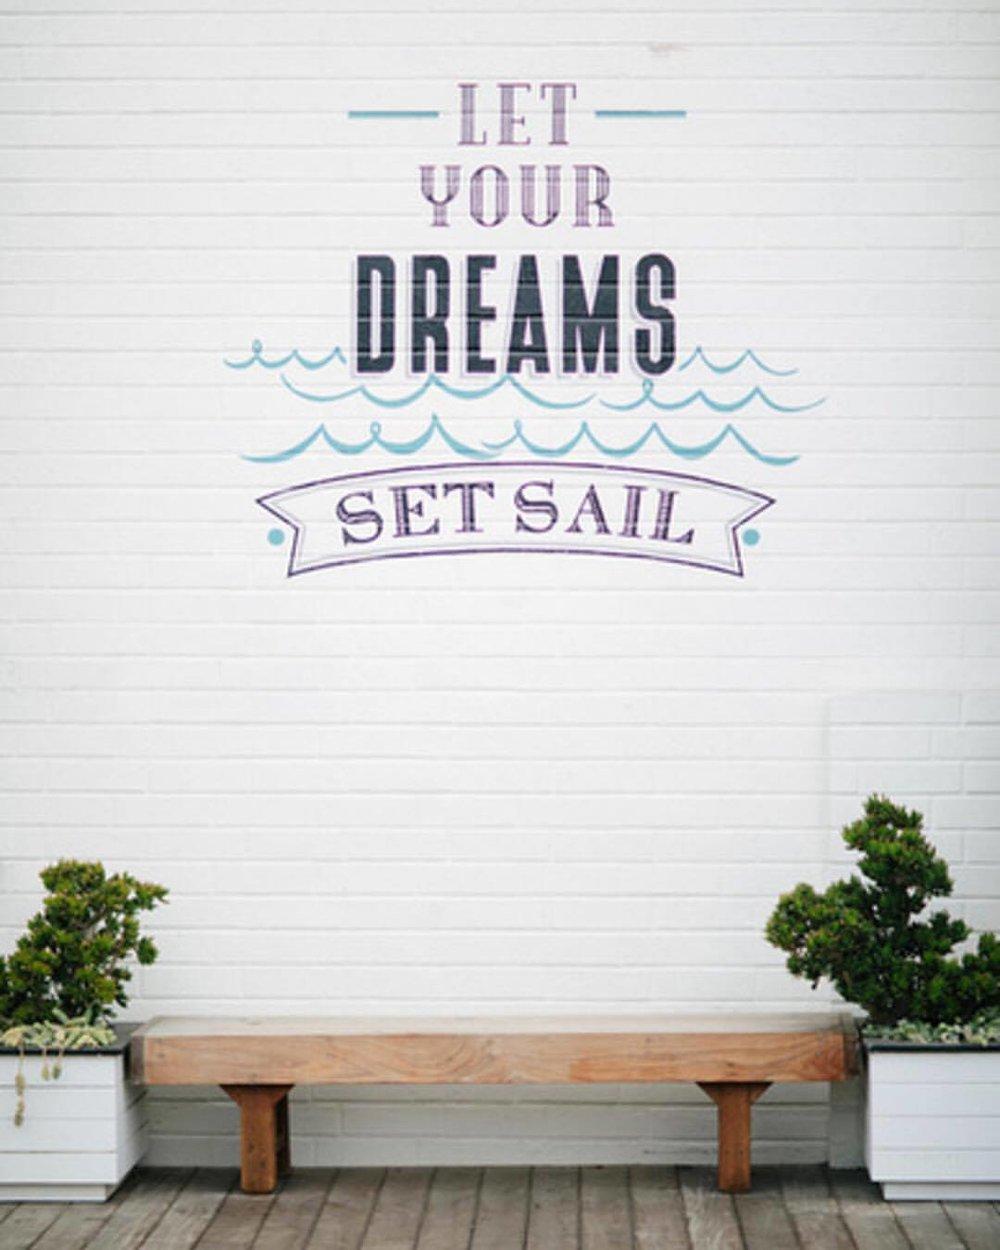 #MondayMantra ✨ Dream Big and Never Give Up 🙌🏻   #homesbydkcowles  #dkfindshomes